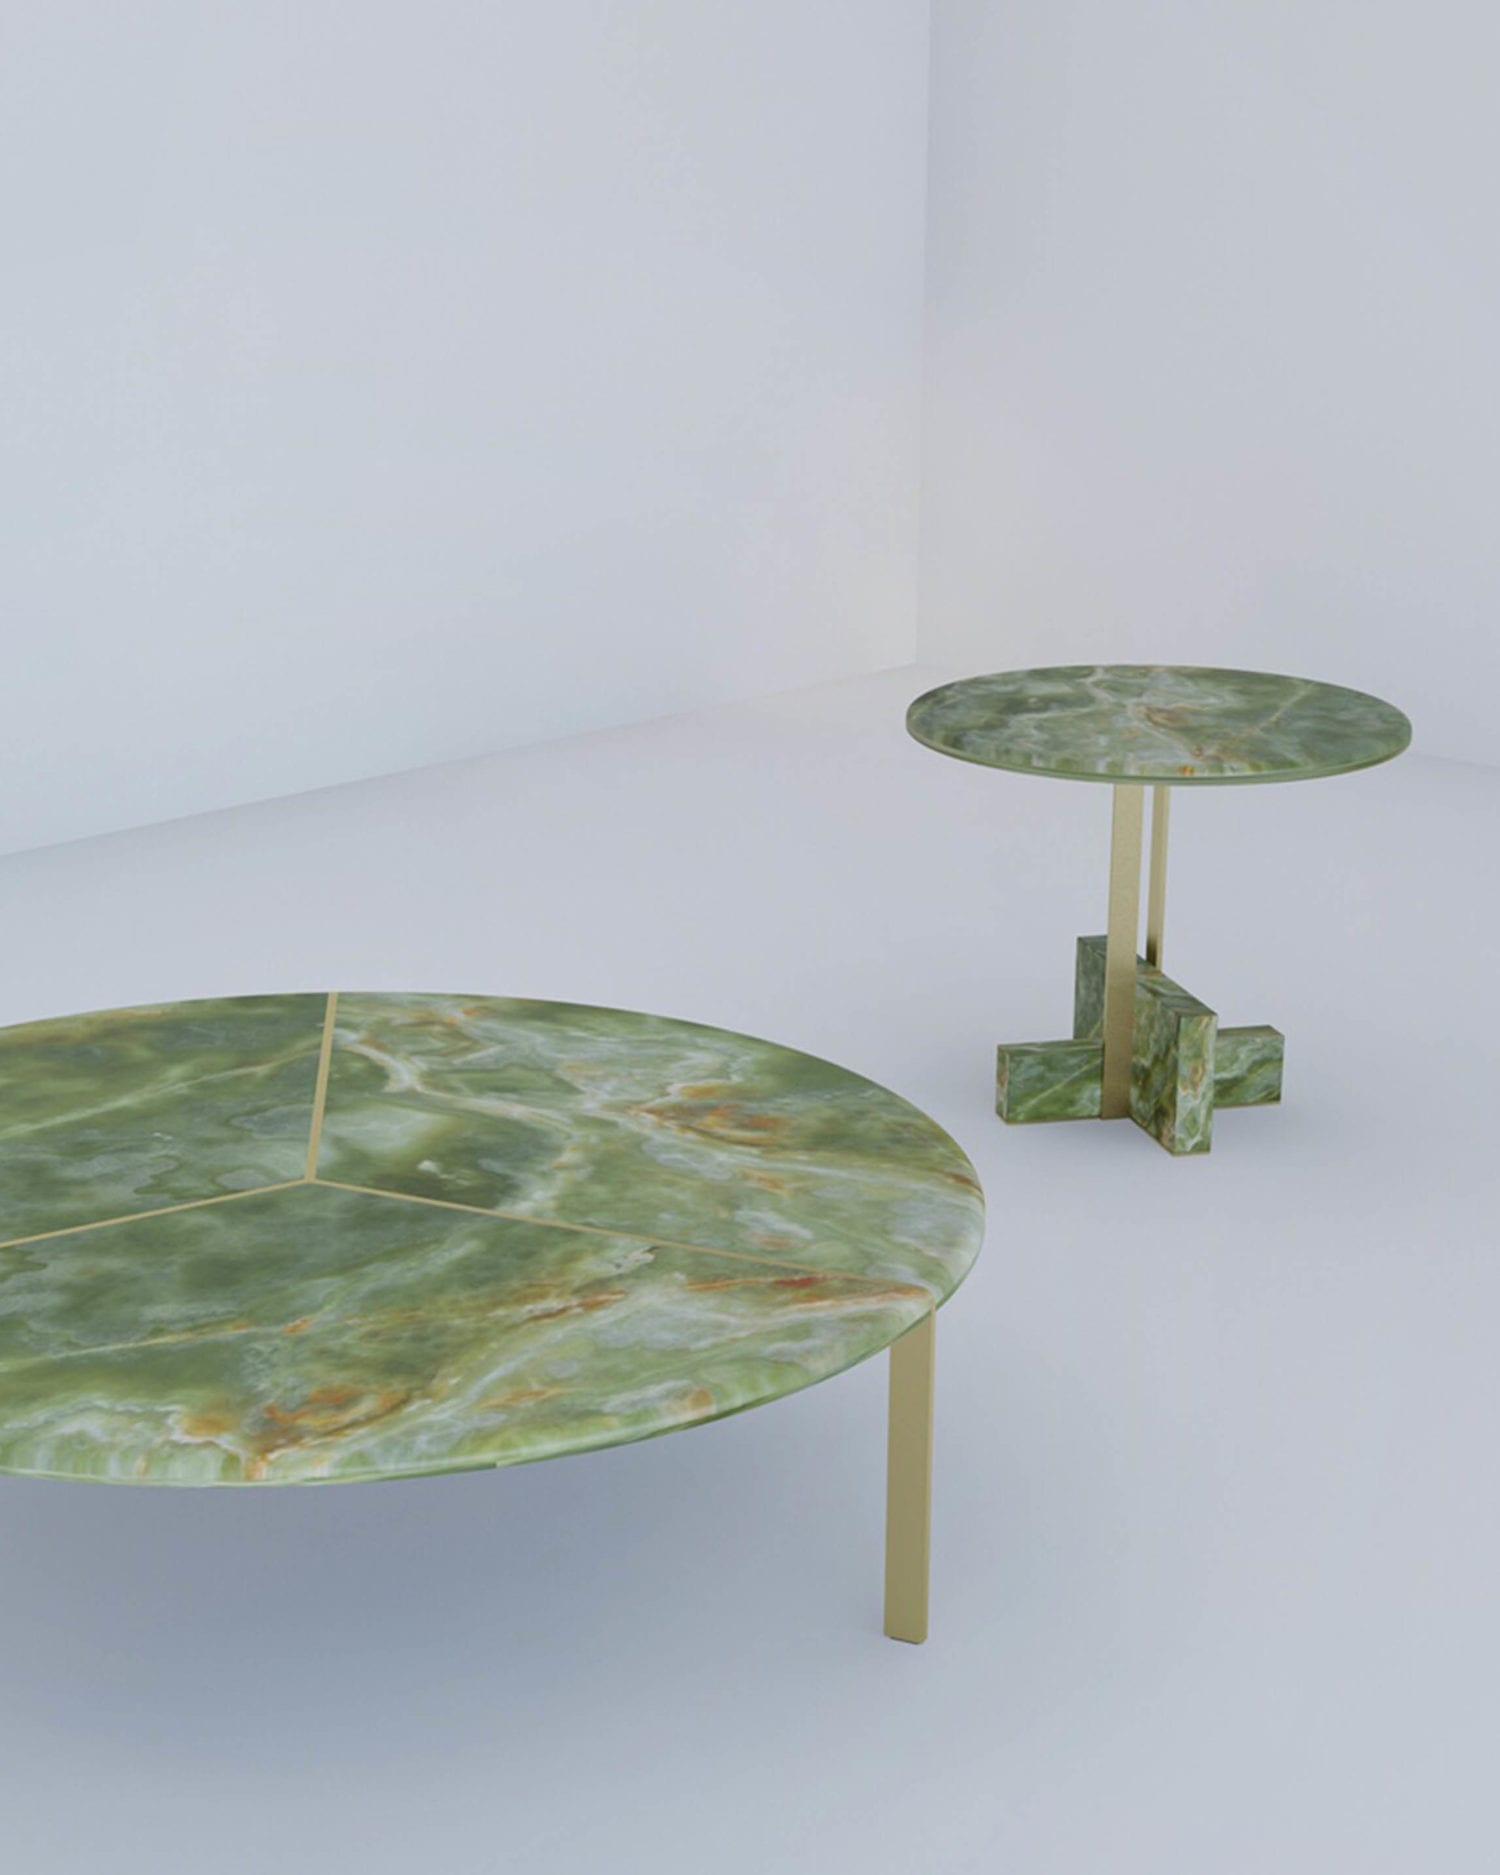 Tacchini Joaquim Bonaguro, Milan Design Week 2019 | Yellowtrace